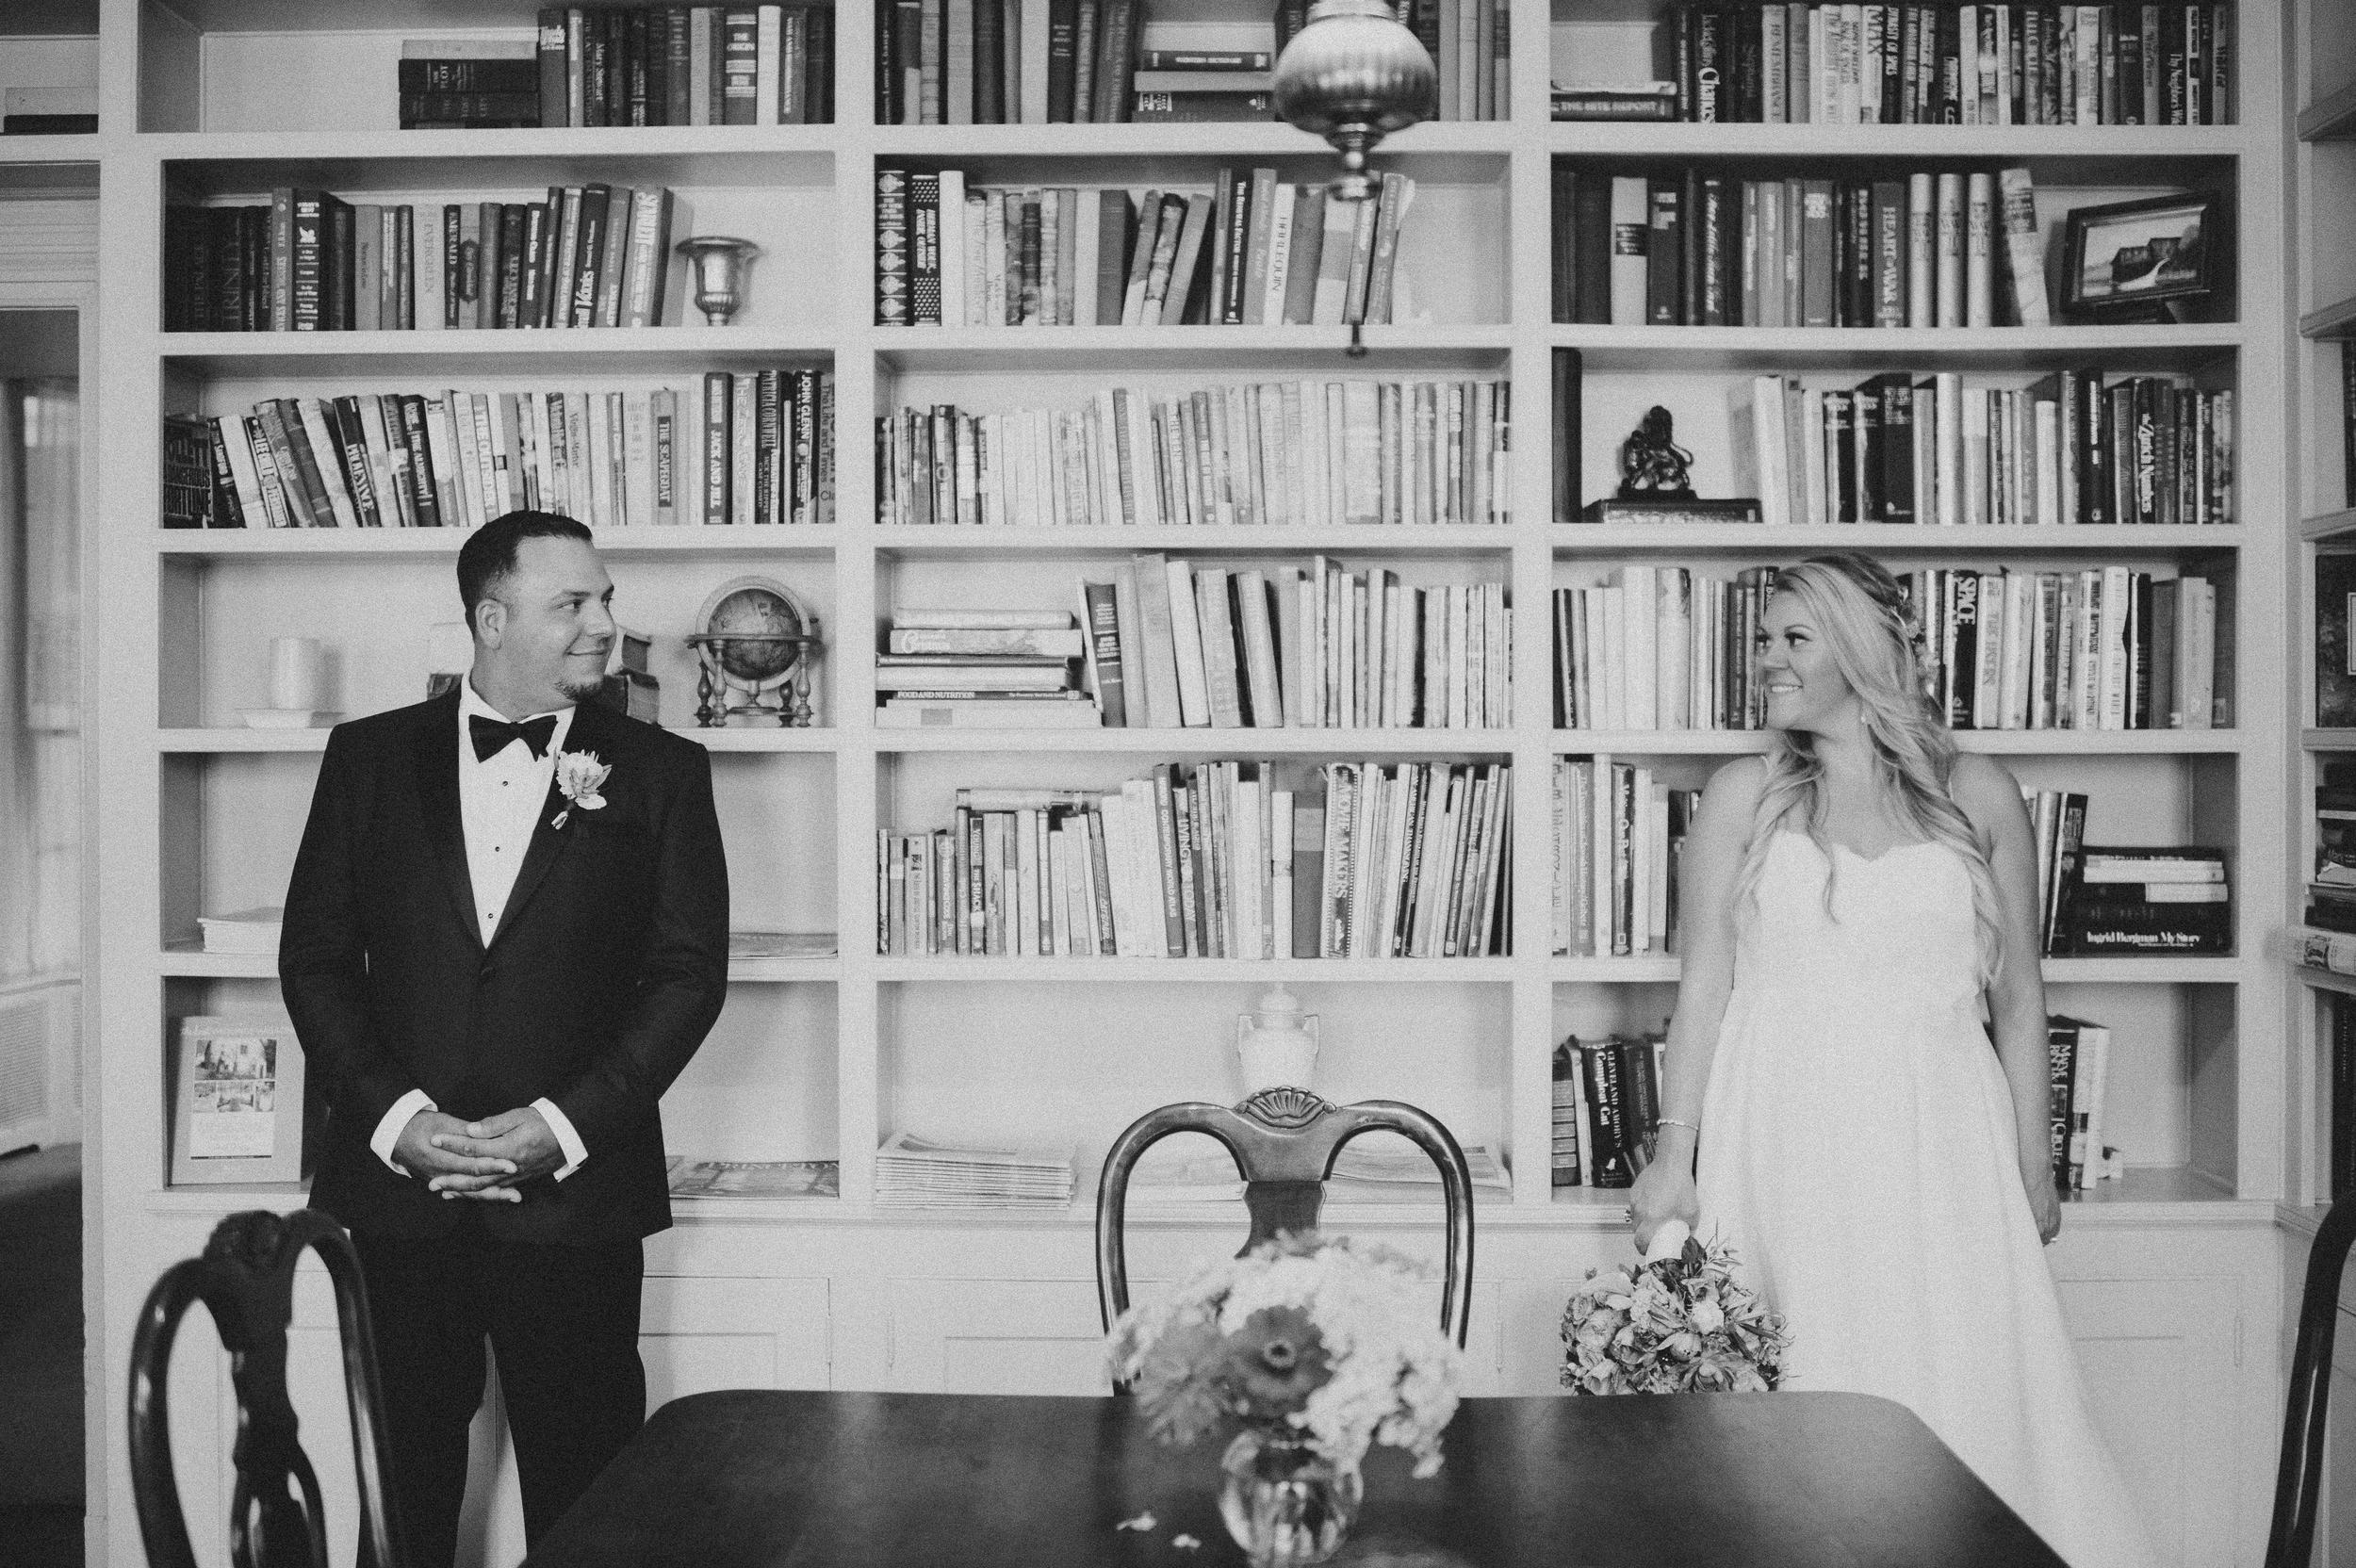 holly-hedge-estate-wedding-photographer-pat-robinson-photography-39.jpg